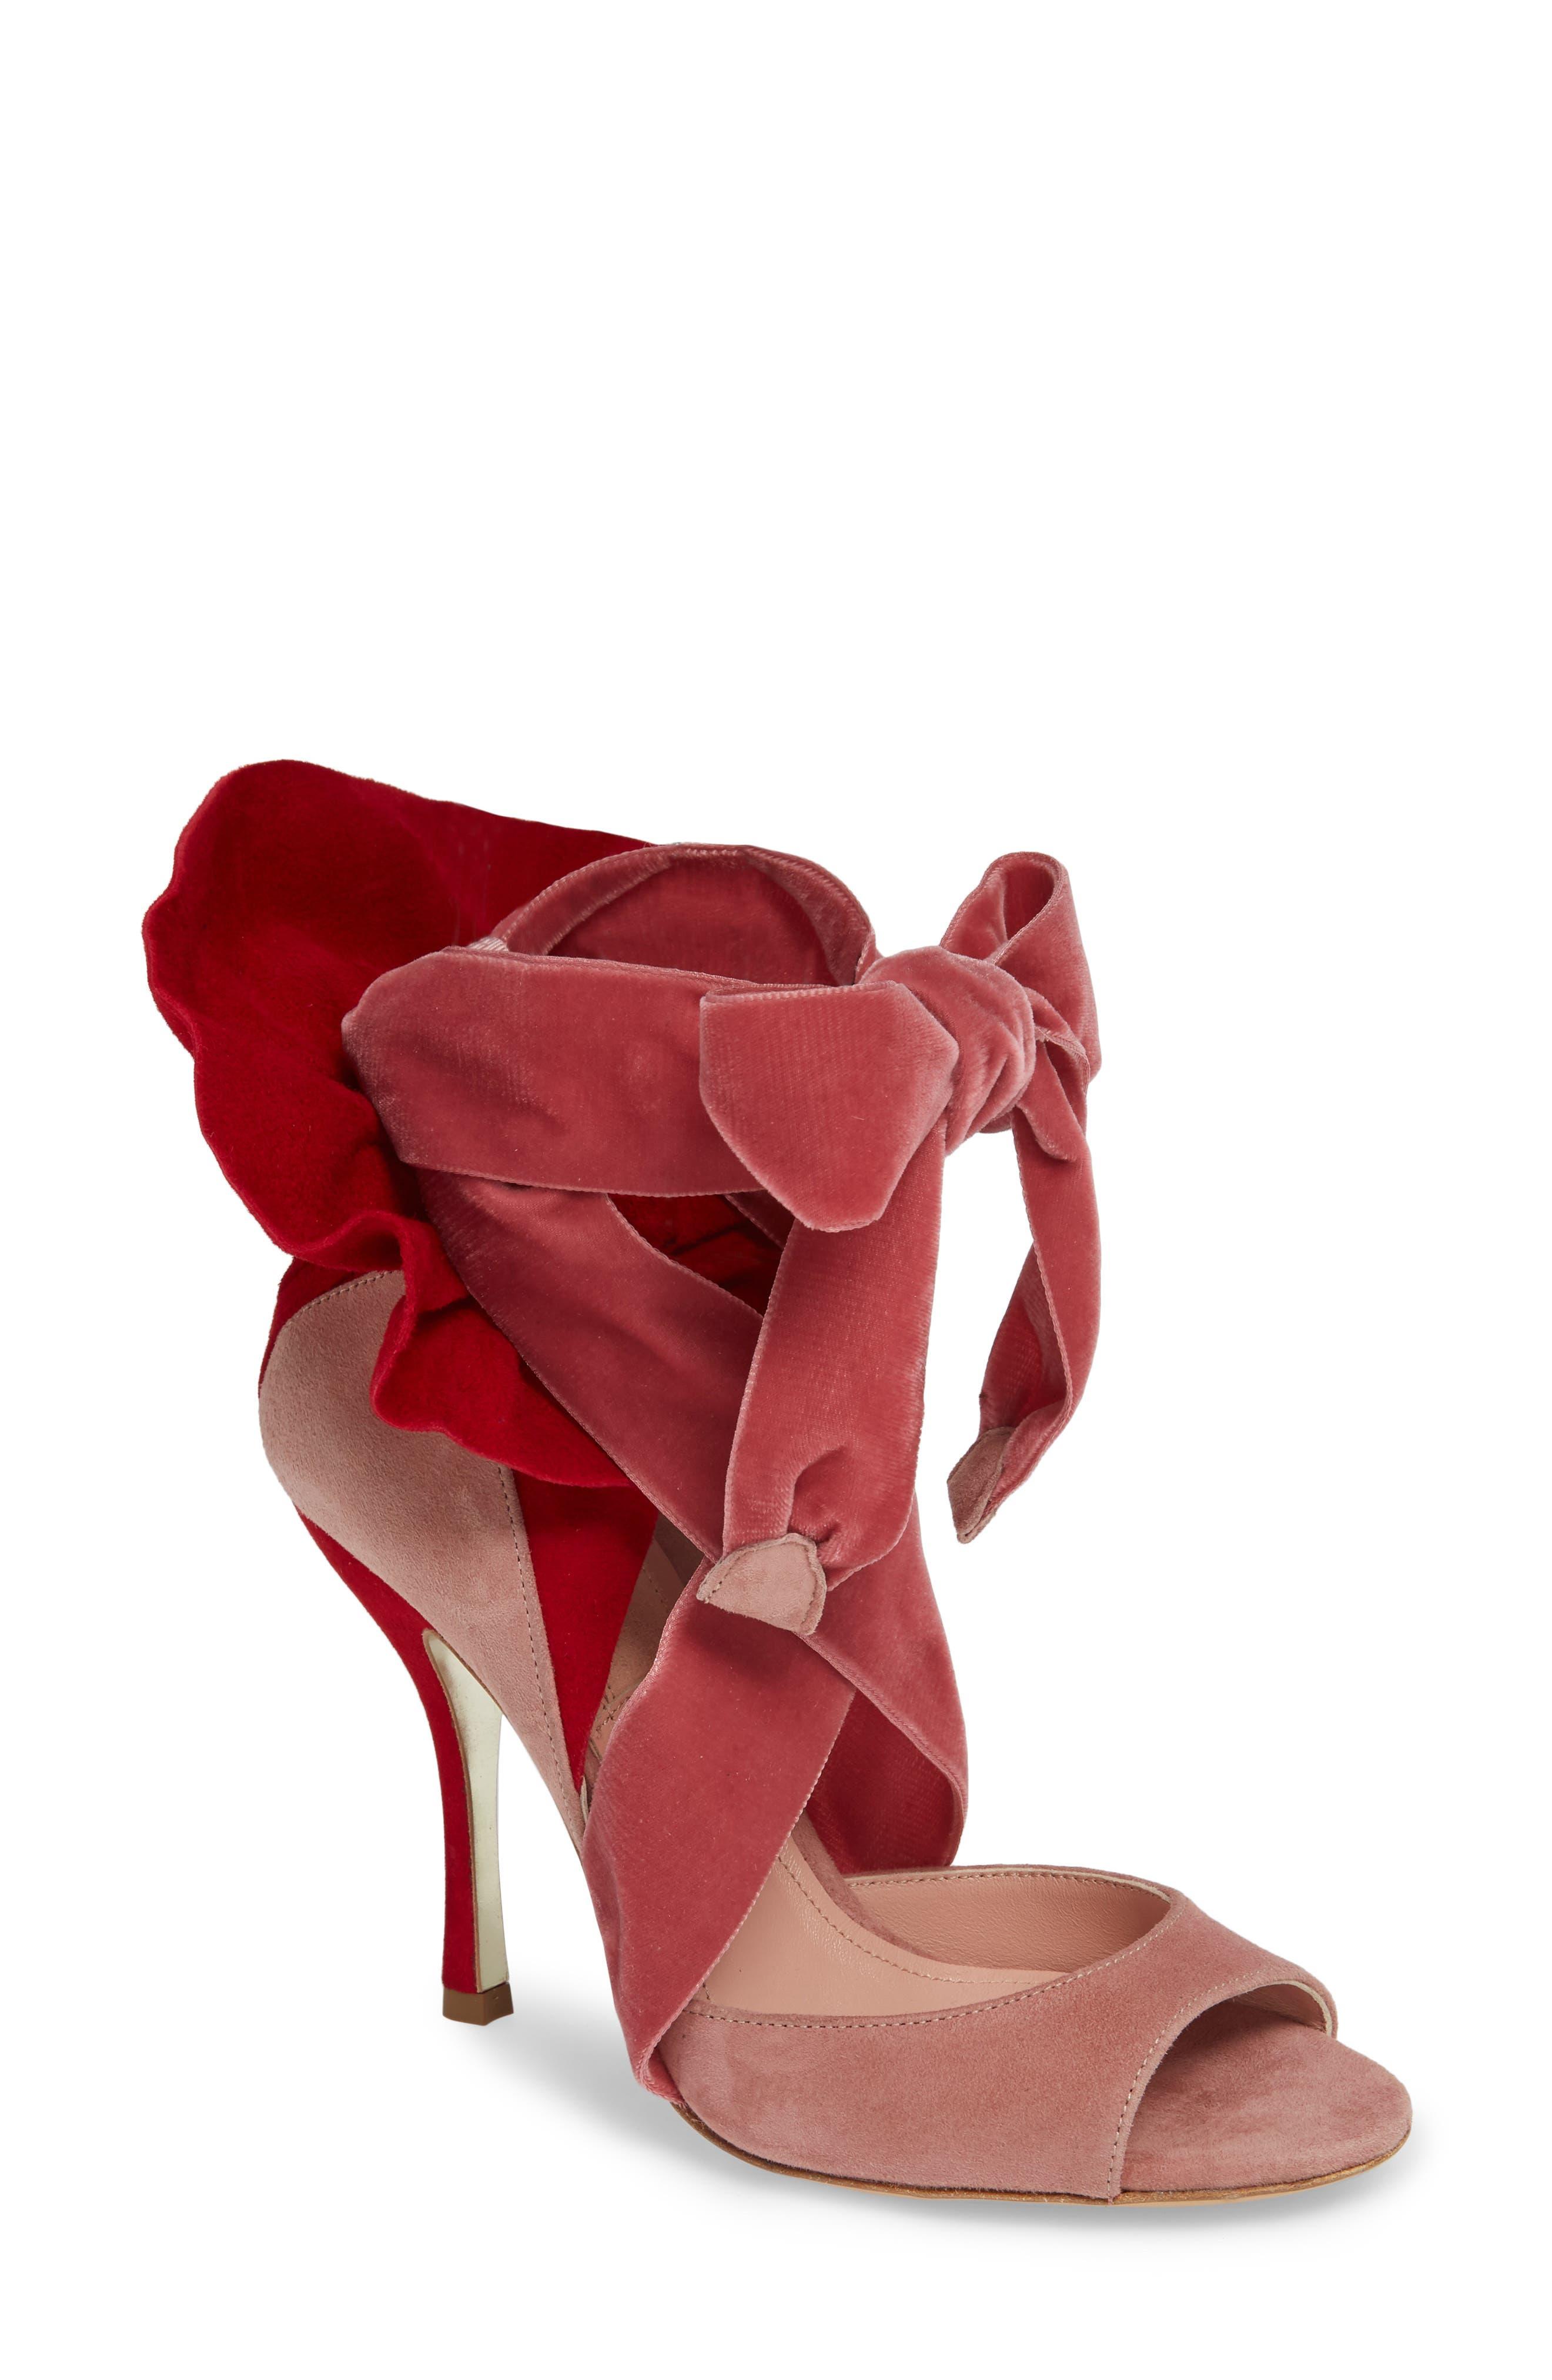 Frills For All Sandal,                         Main,                         color, Rose/ Red